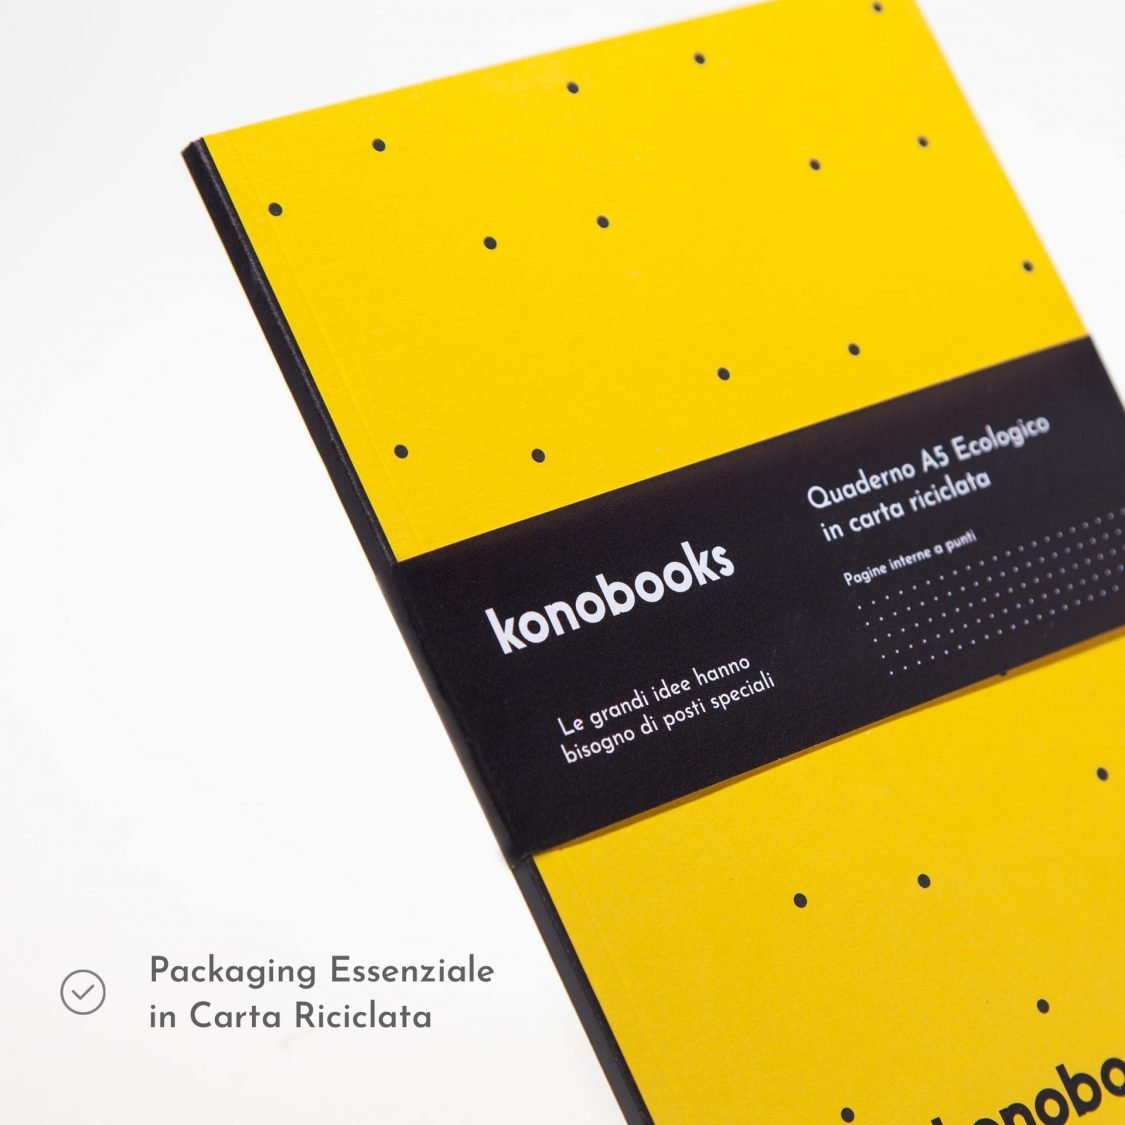 Quaderno ecologico puntinato Konobooks